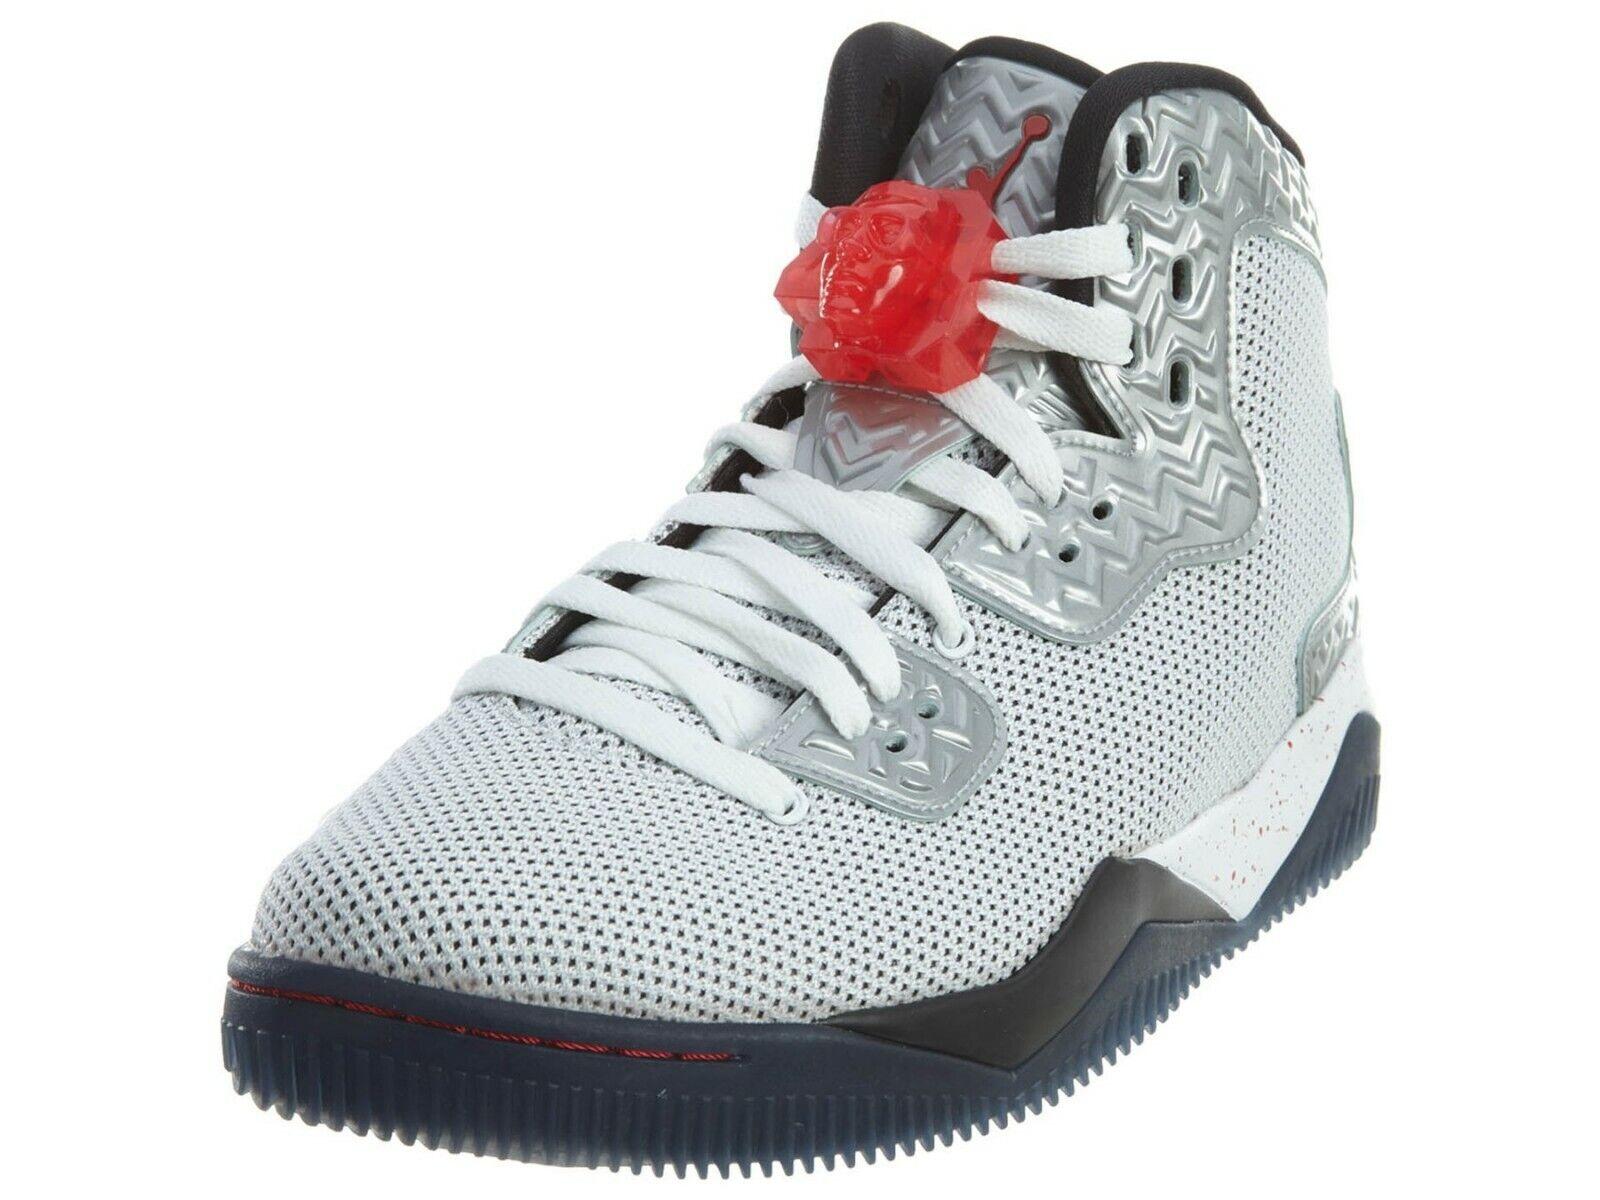 NIB AIR JORDAN Nike Air Jordan Spike Forty PE, White Fire Red Black - Size 12